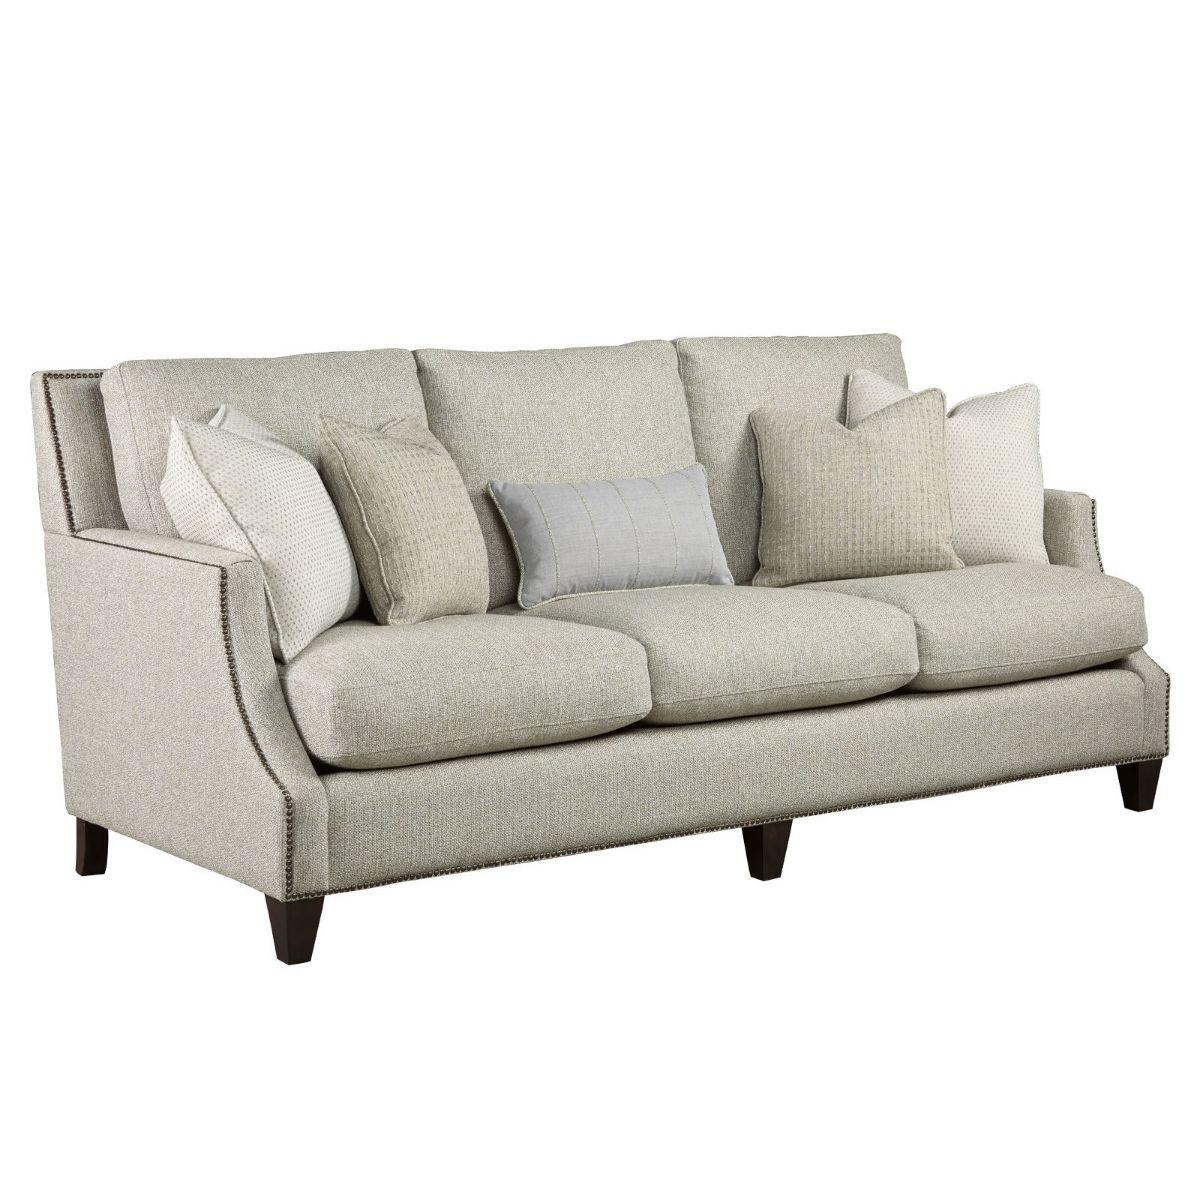 Brady 3 Seat Scoop Arm Sofa With Nailheads Modern Leather Sofa Modern Sofa Upholstered Sofa